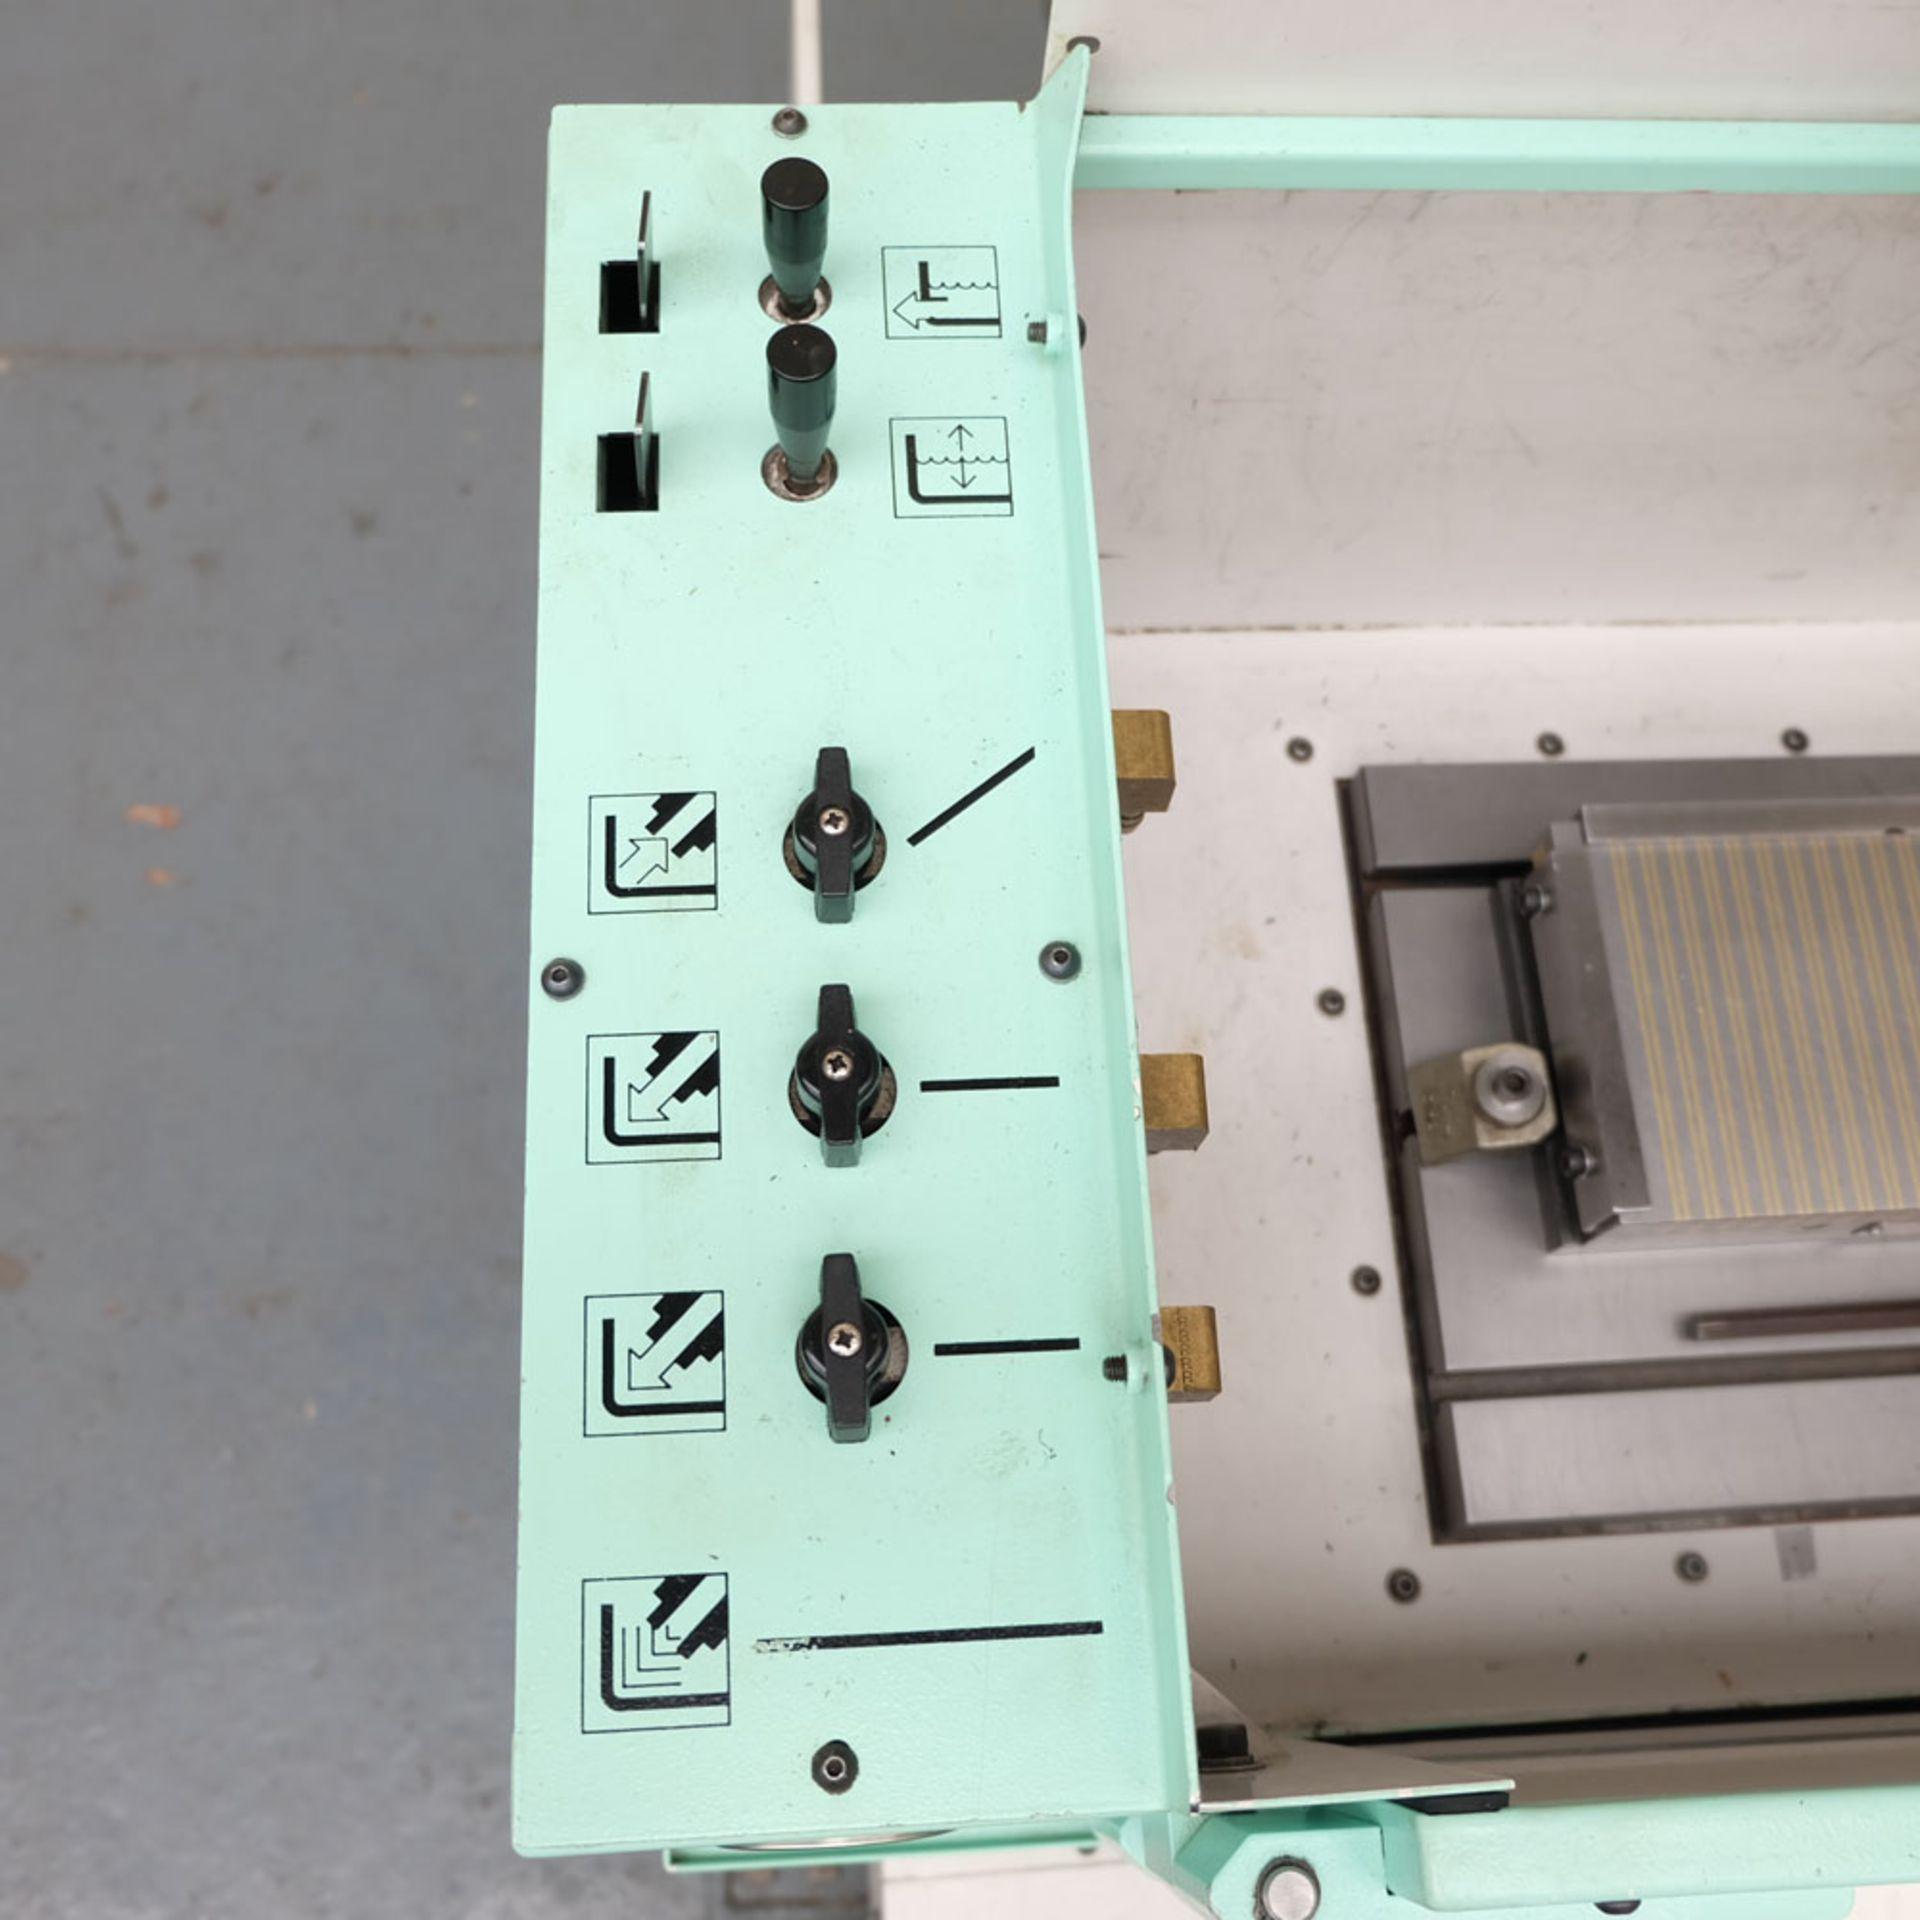 AGIE Mondo Star 20. EDM/Die Sinking Machine With Agie Futura V 1PM Control. - Image 4 of 16